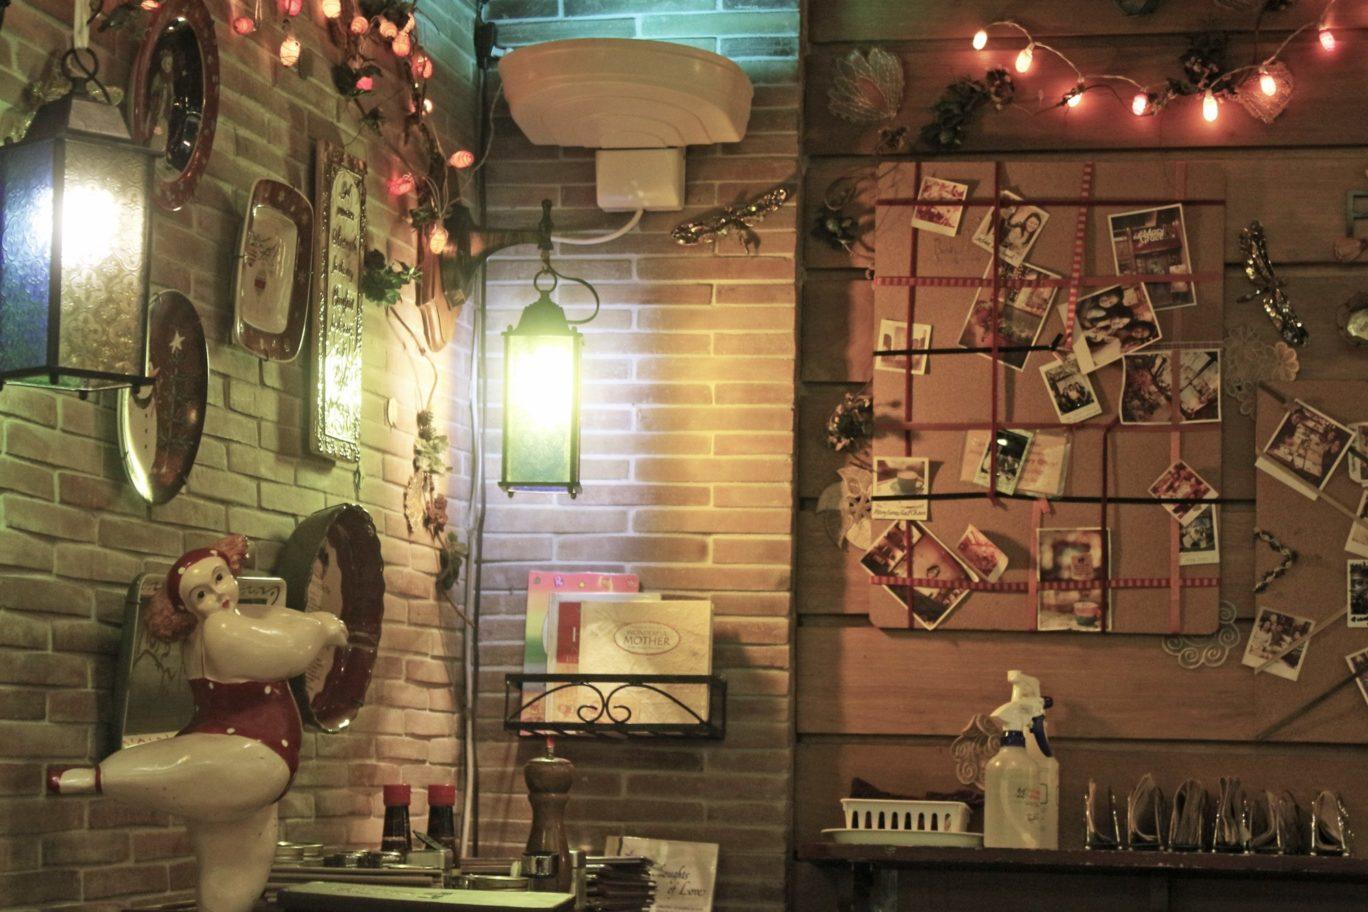 Wall Decor at Cafe Mary Grace, Greenbelt Makati